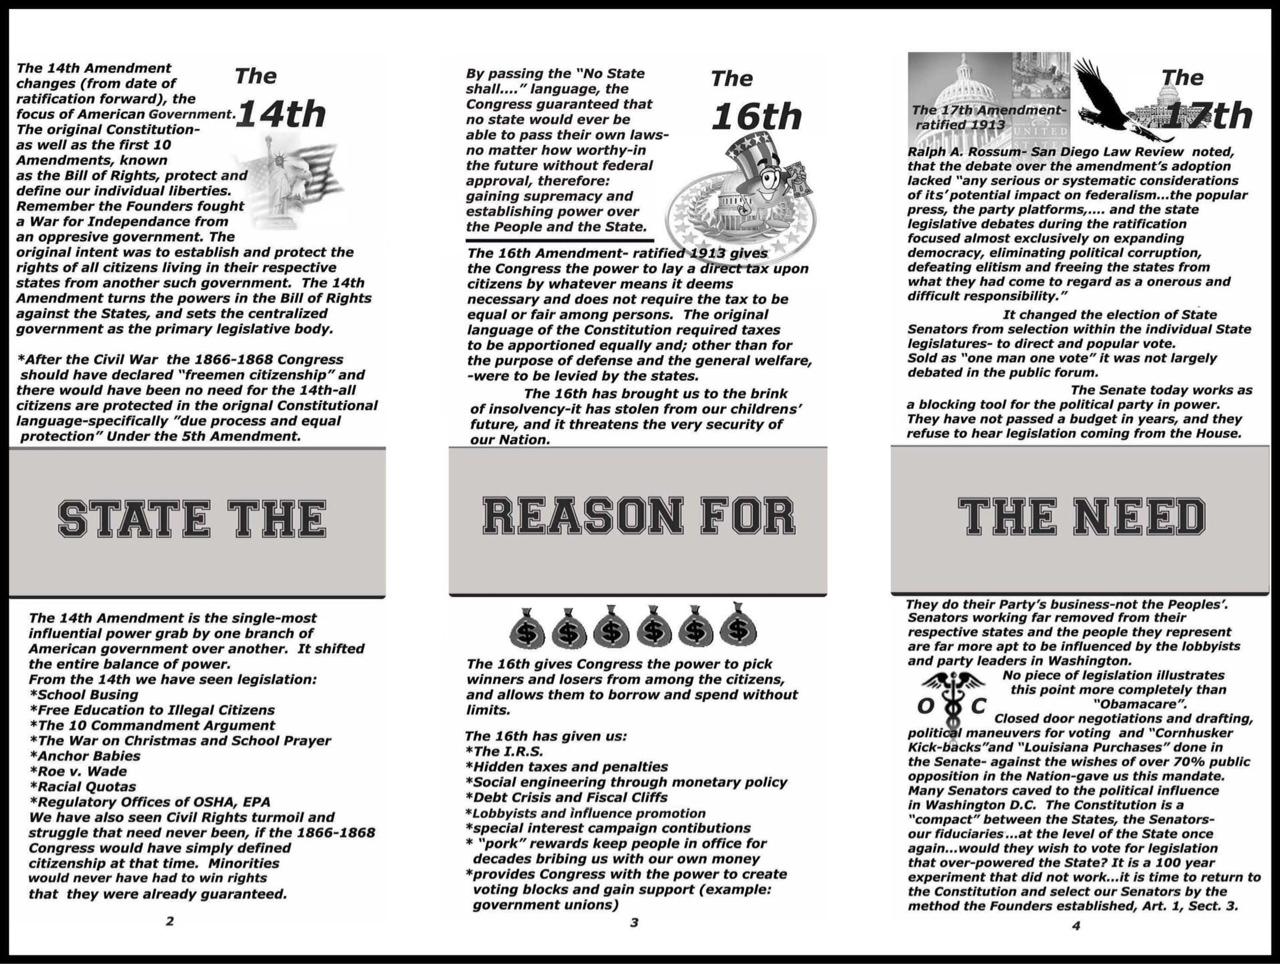 blk white trifold brochure